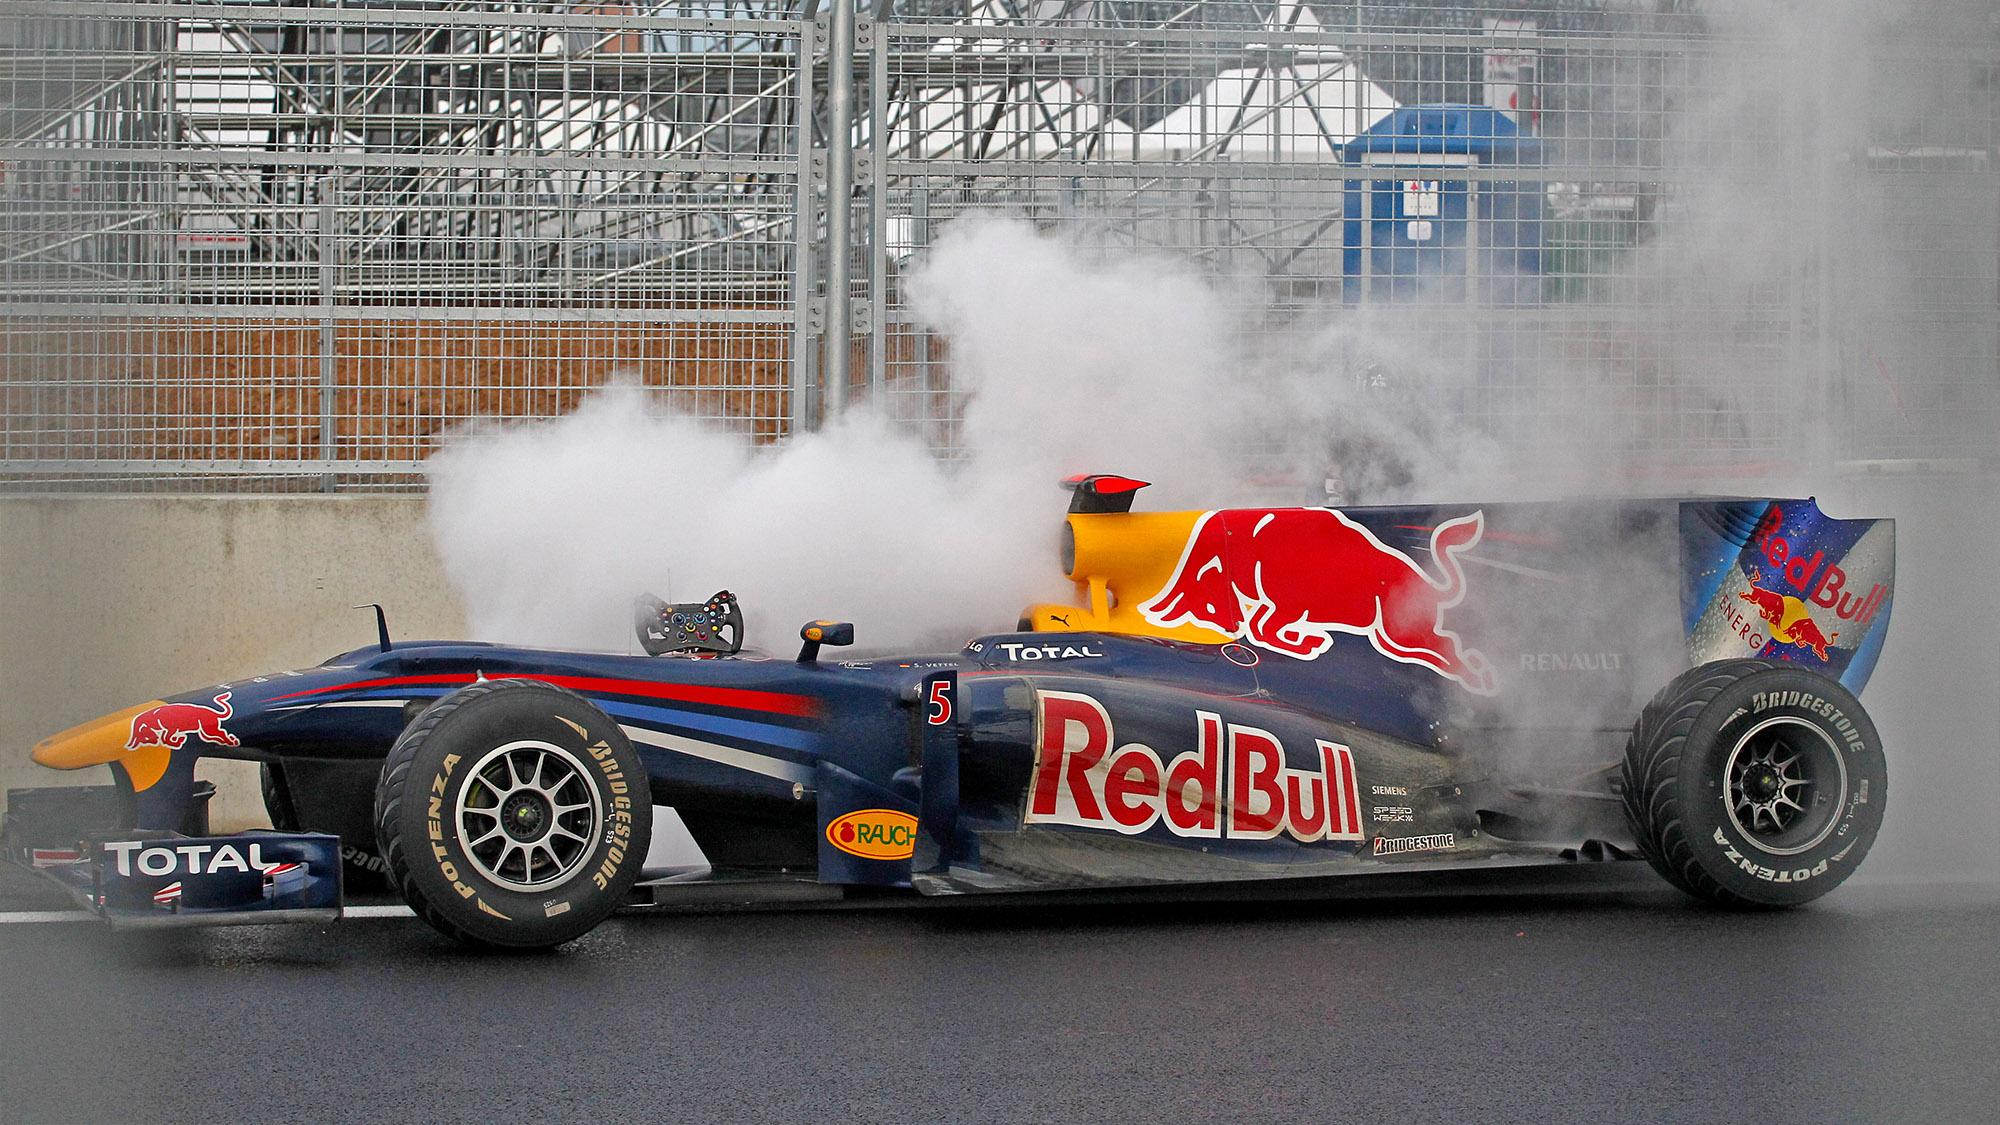 Sebastian Vettel's smoking Red Bull at the 2010 Korean Grand Prix